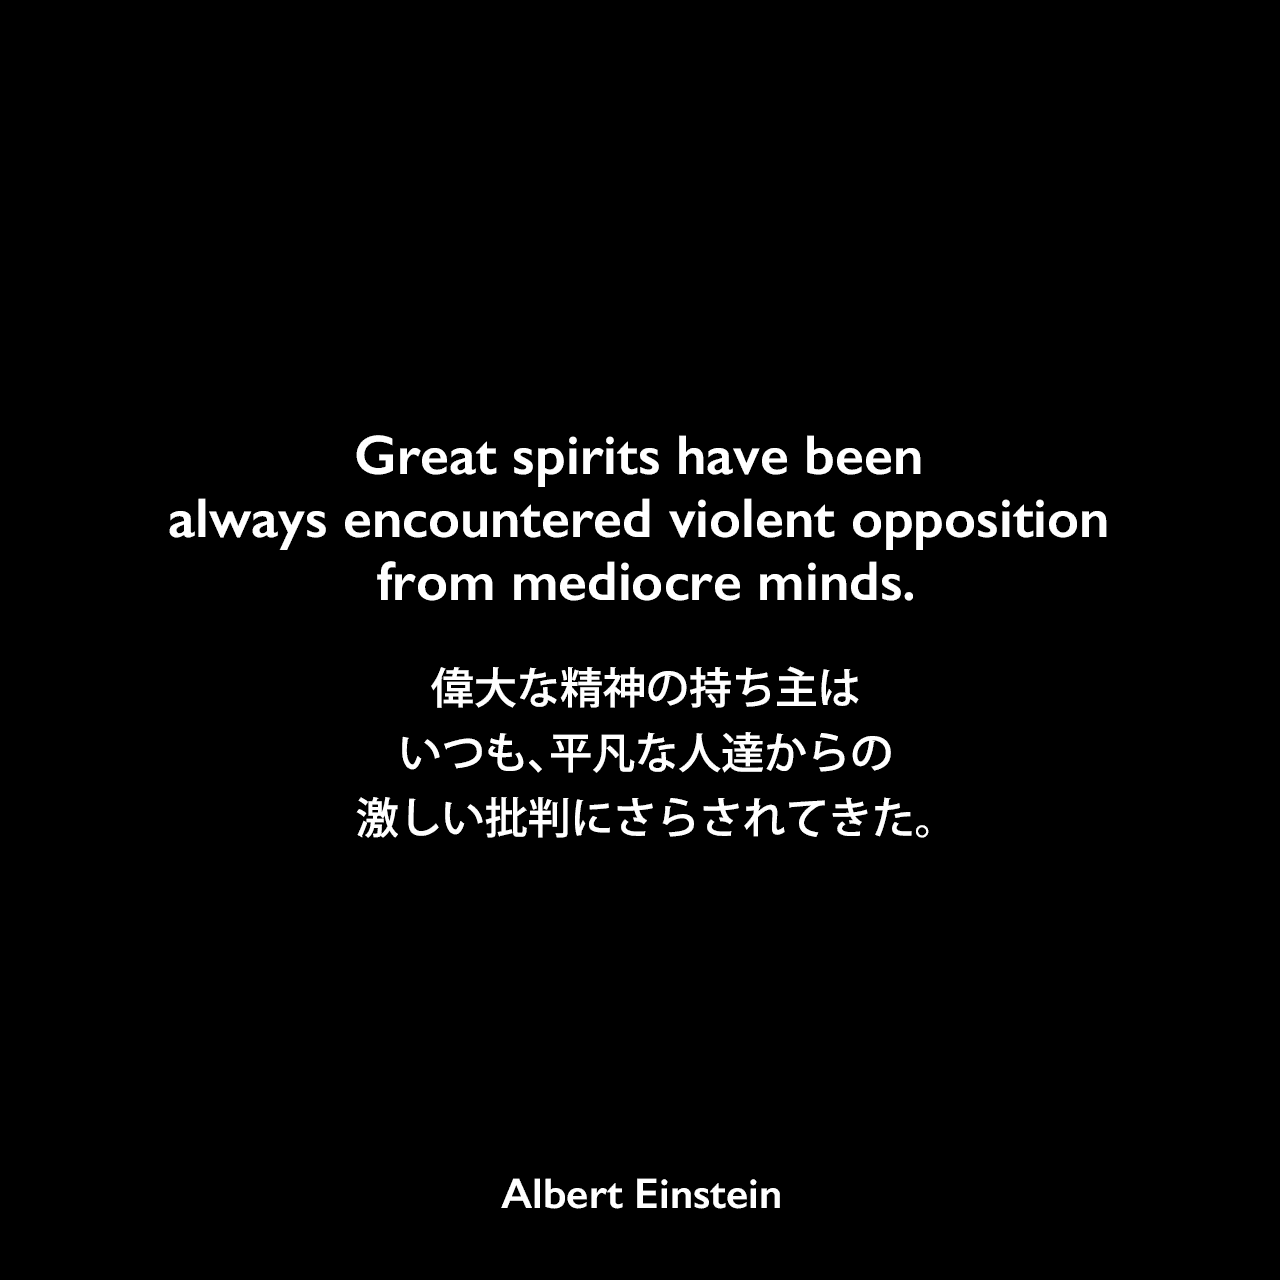 Great spirits have been always encountered violent opposition from mediocre minds.偉大な精神の持ち主はいつも、平凡な人達からの激しい批判にさらされてきた。- アインシュタイン がニューヨーク市立大学哲学名誉教授モリス・ラファエル・コーエンに宛てた手紙(1940年3月19日)よりAlbert Einstein